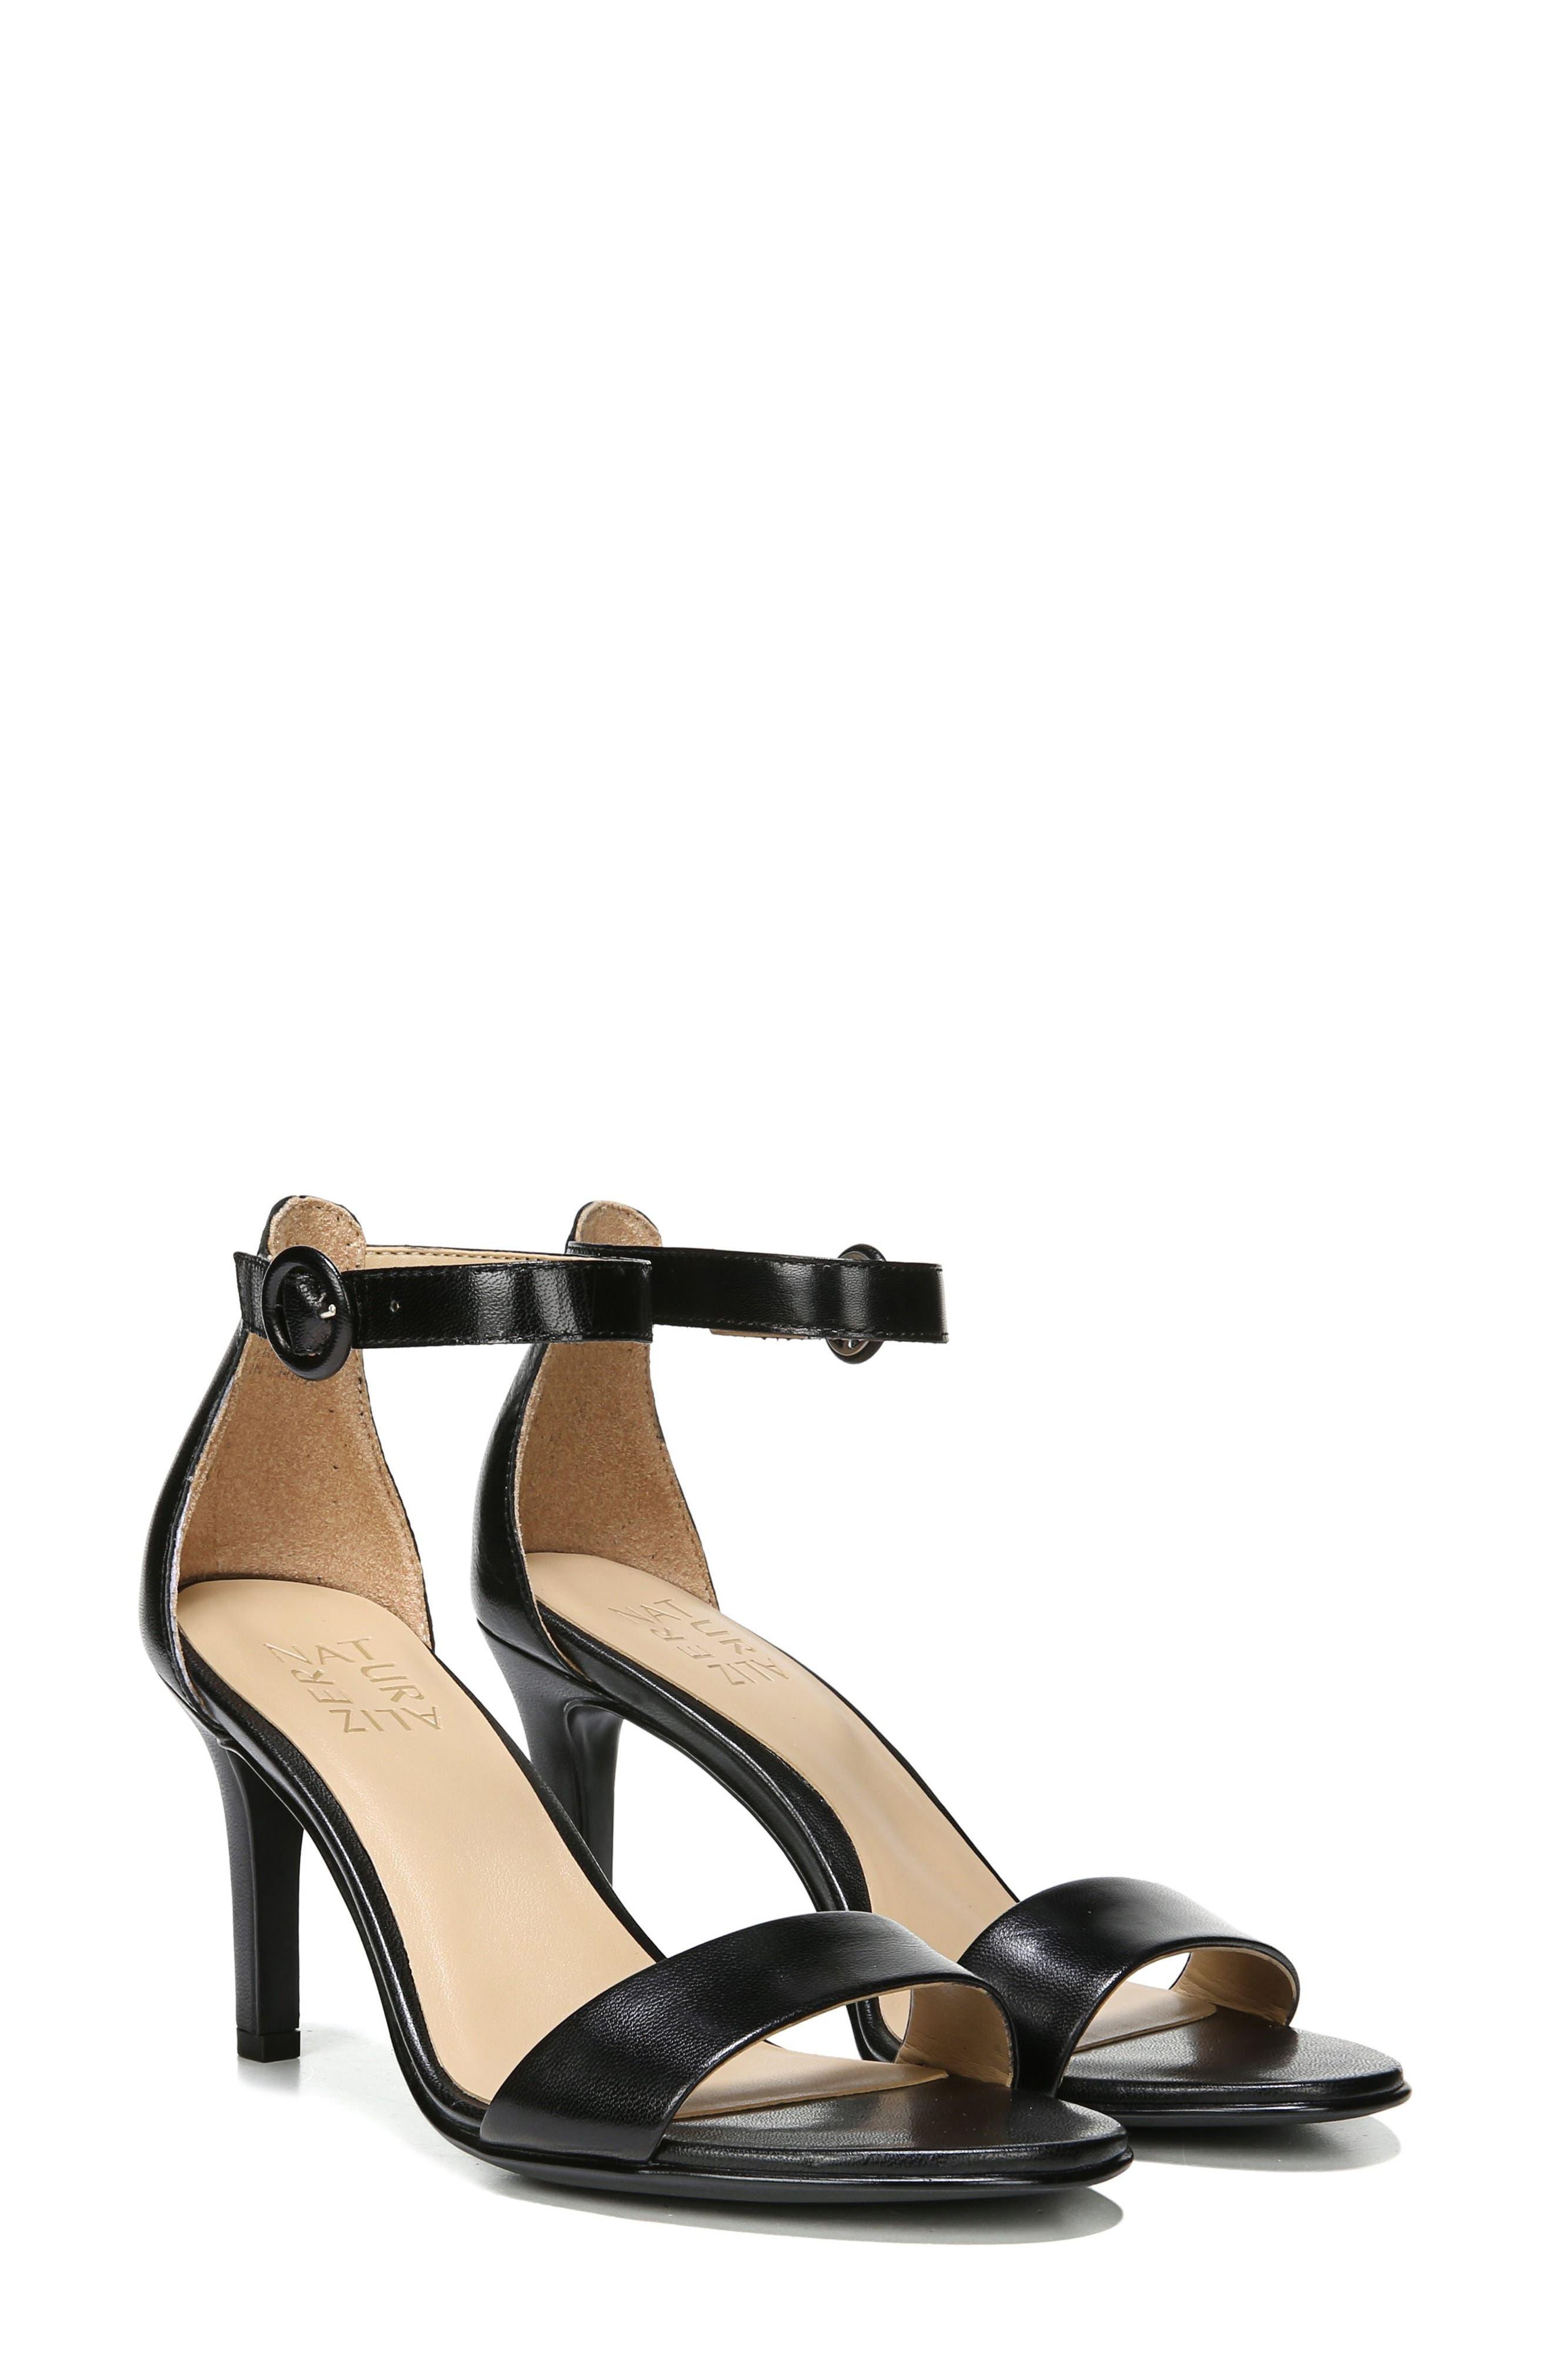 NATURALIZER, Kinsley Ankle Strap Sandal, Alternate thumbnail 7, color, BLACK LEATHER